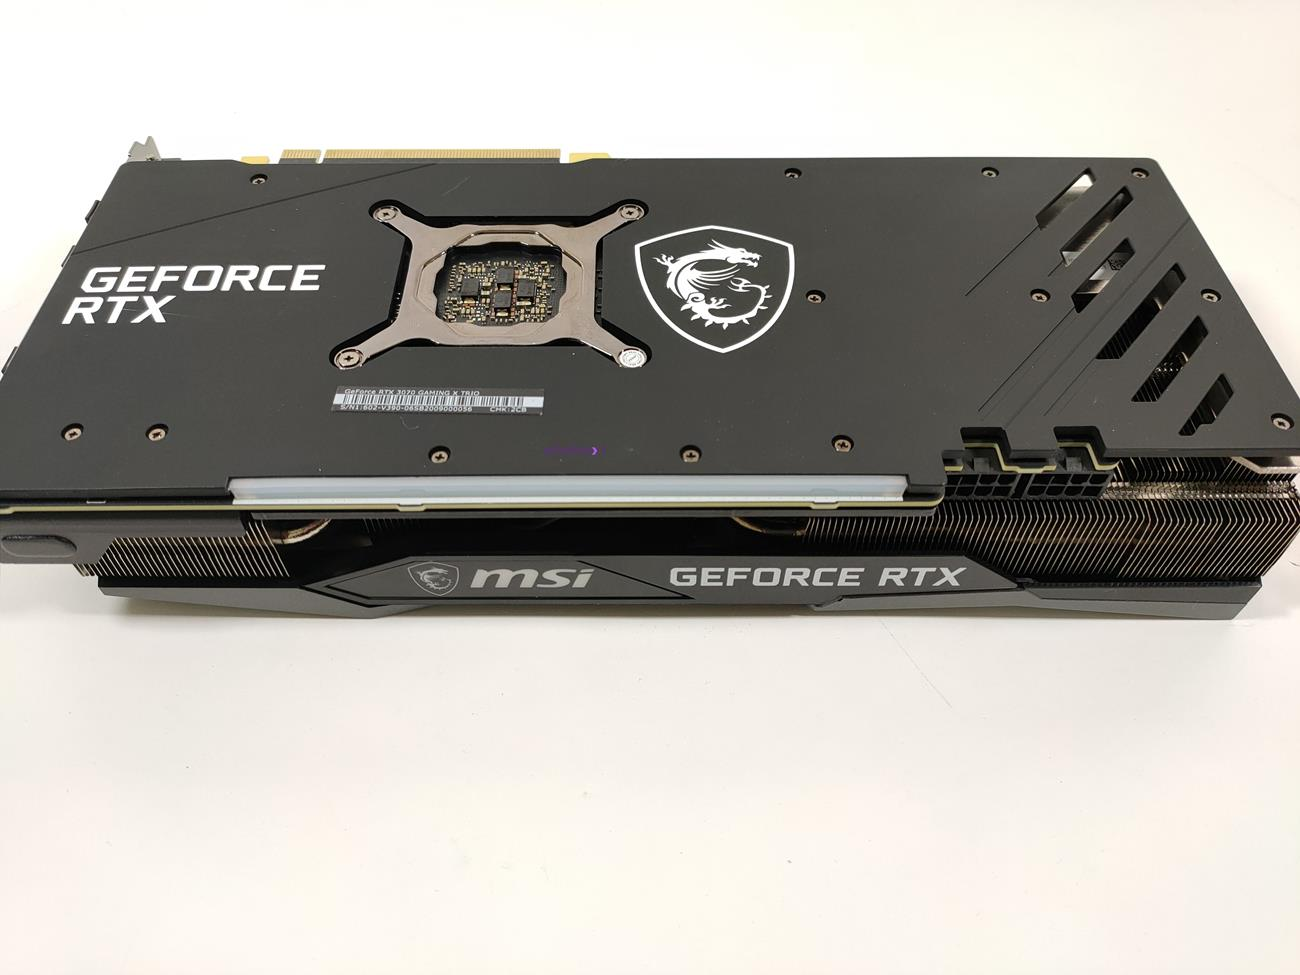 Test MSI GeForce RTX 3070 Gaming X trio, recenzja MSI GeForce RTX 3070 Gaming X trio, review MSI GeForce RTX 3070 Gaming X trio, opinia MSI GeForce RTX 3070 Gaming X trio